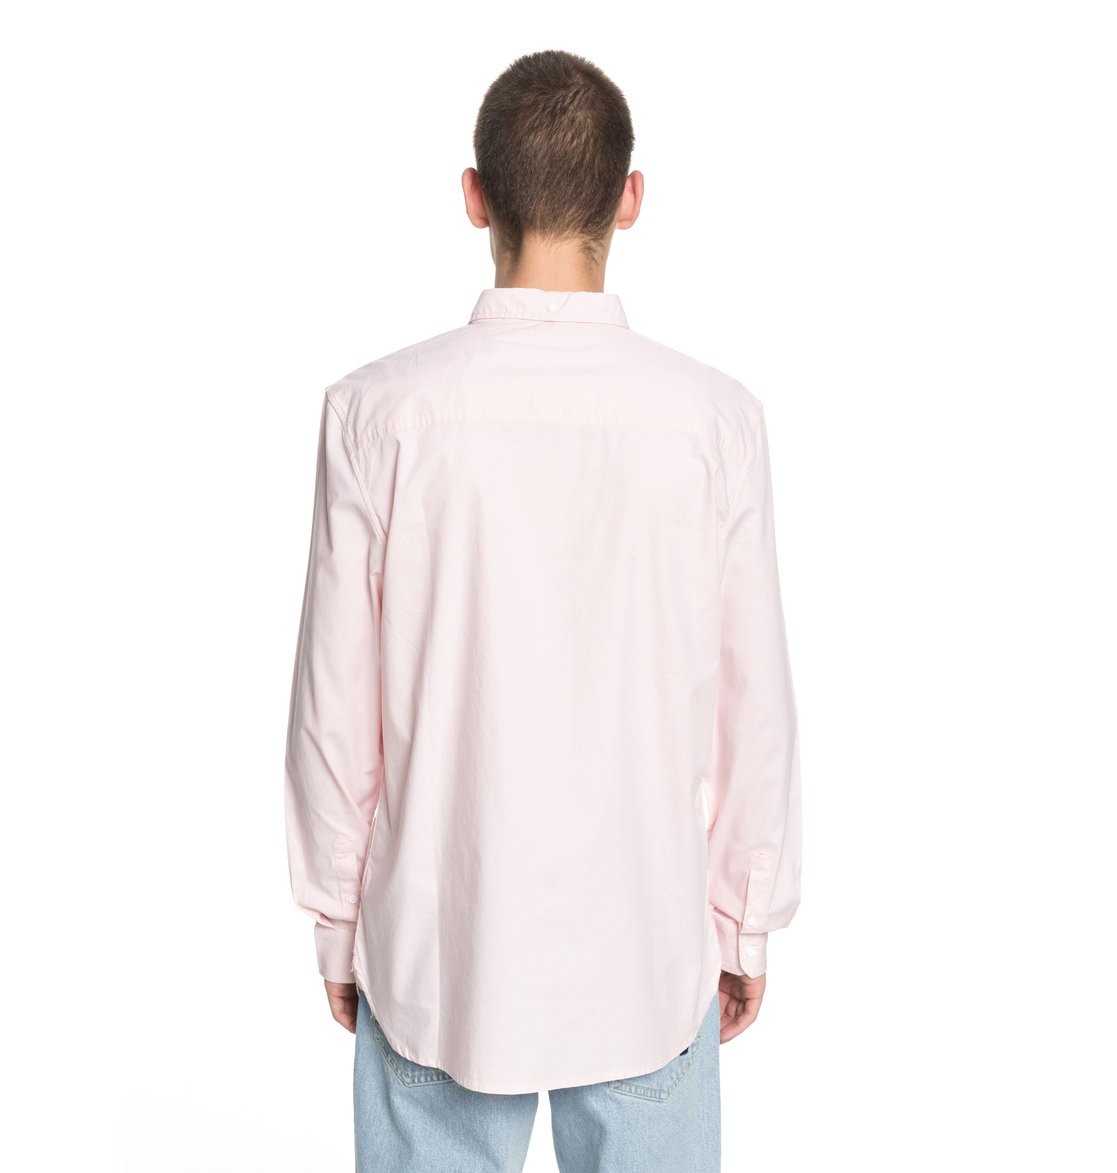 Classic Oxford Light Long Sleeve Shirt 3613373485557